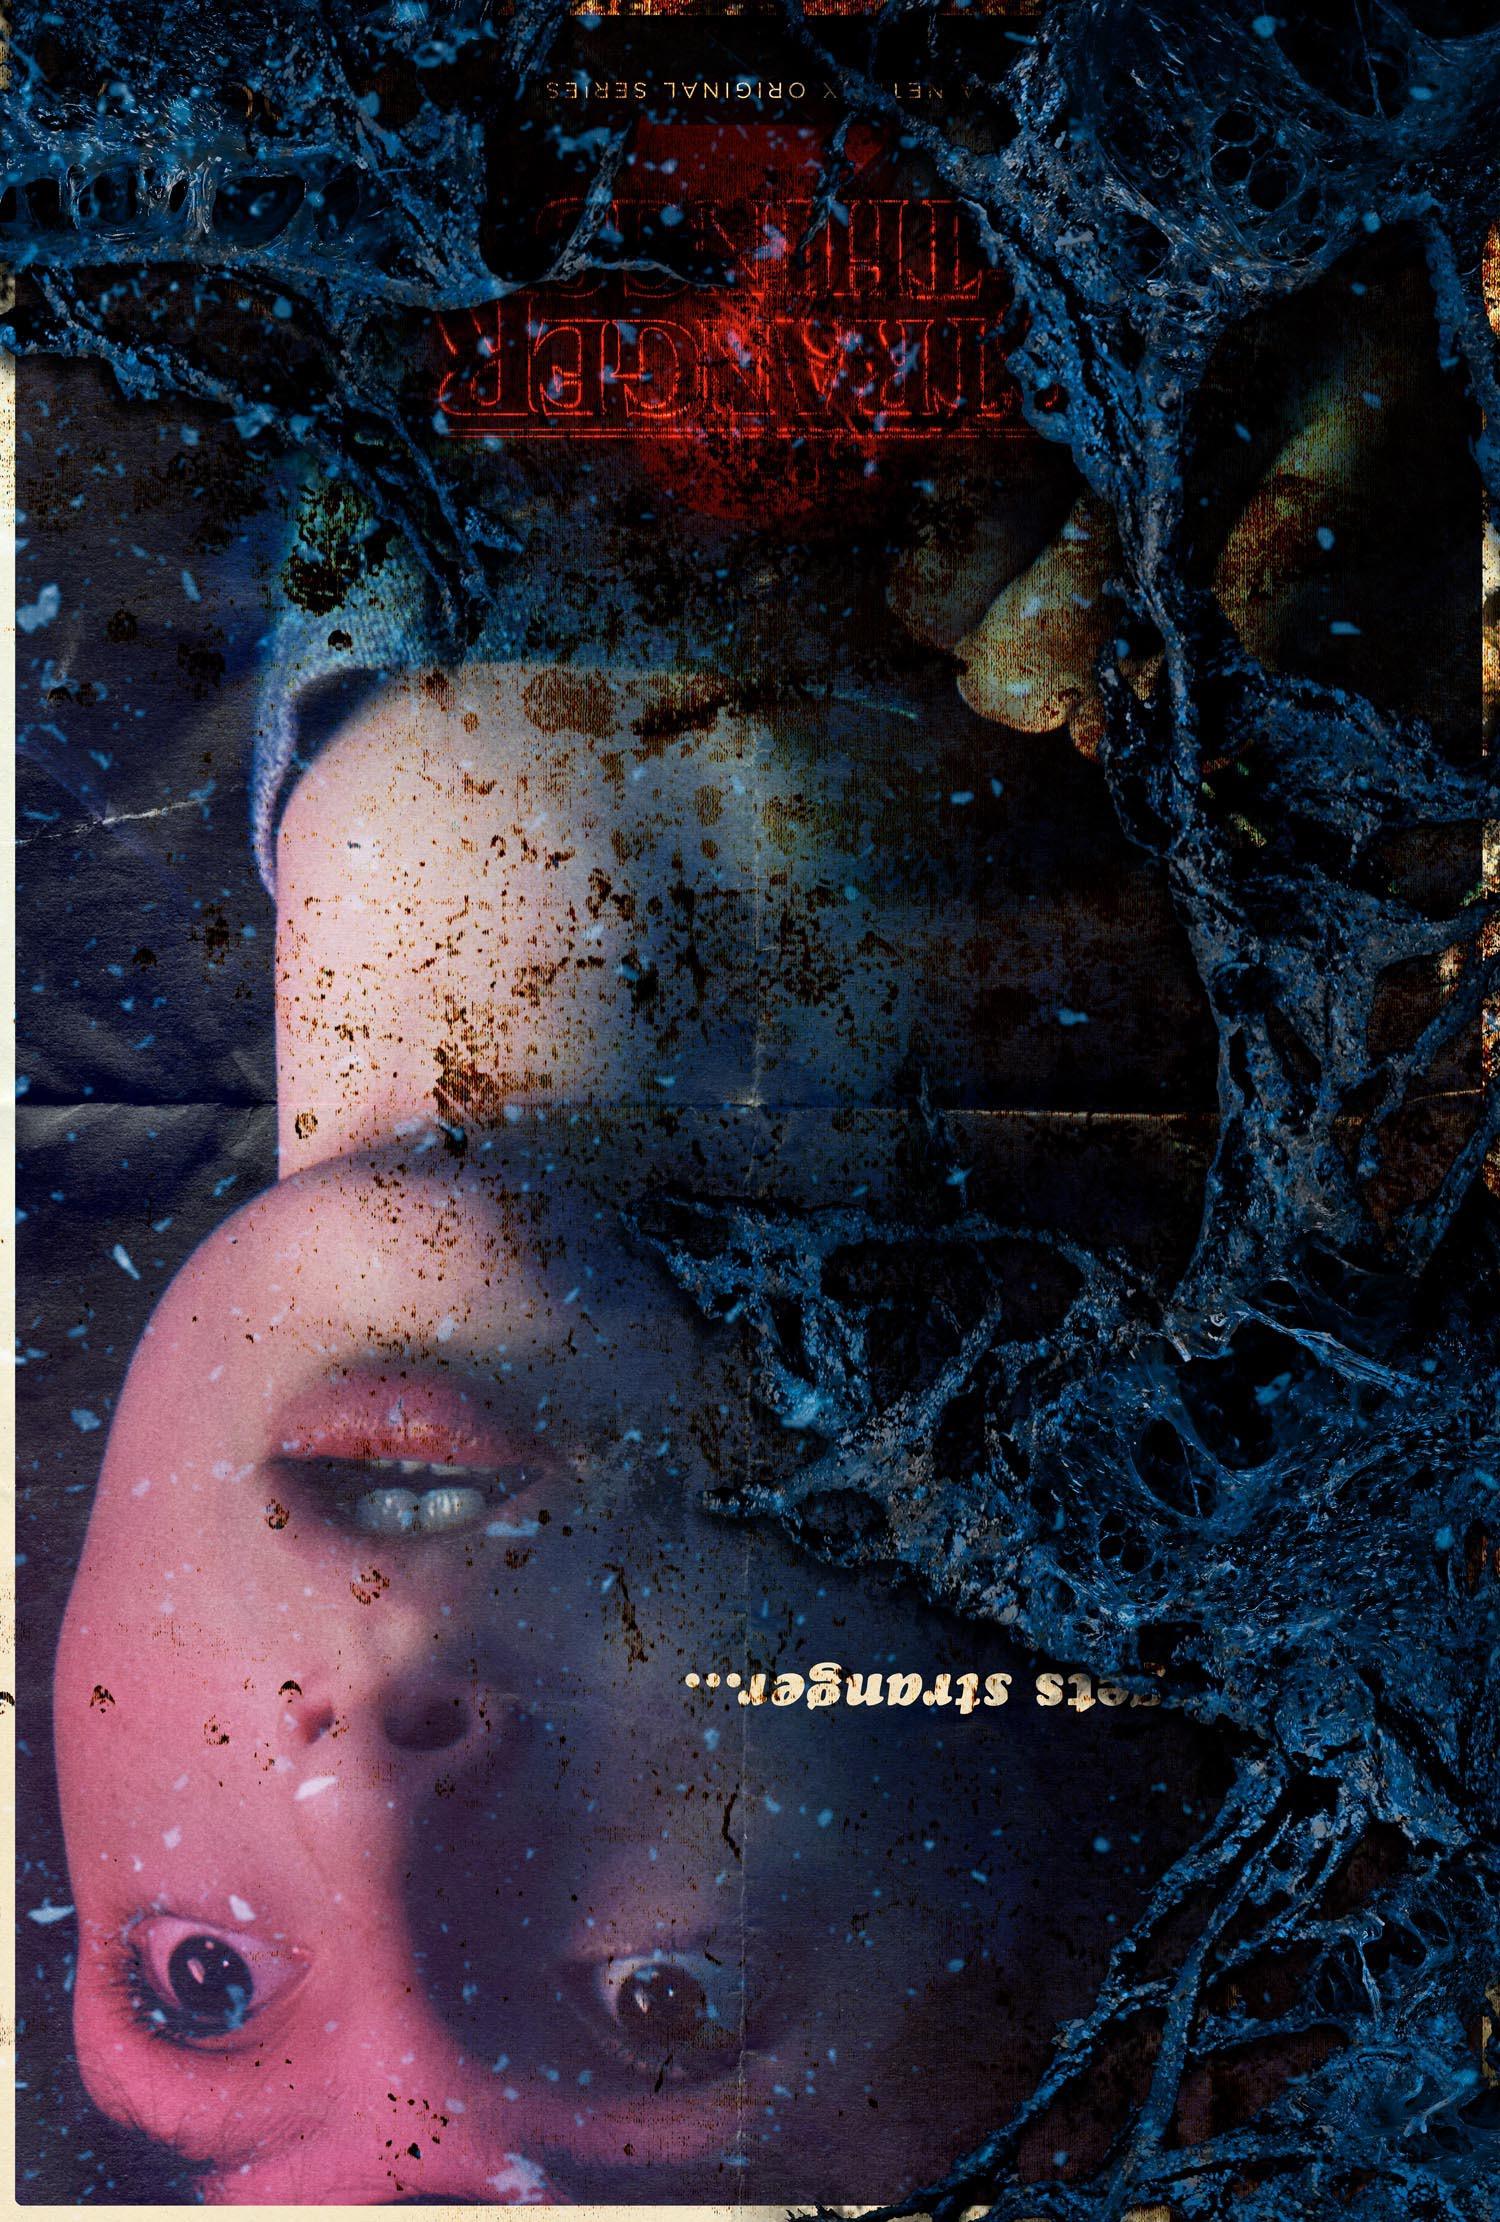 Stranger Things 2 - Upside Down Poster - Mike